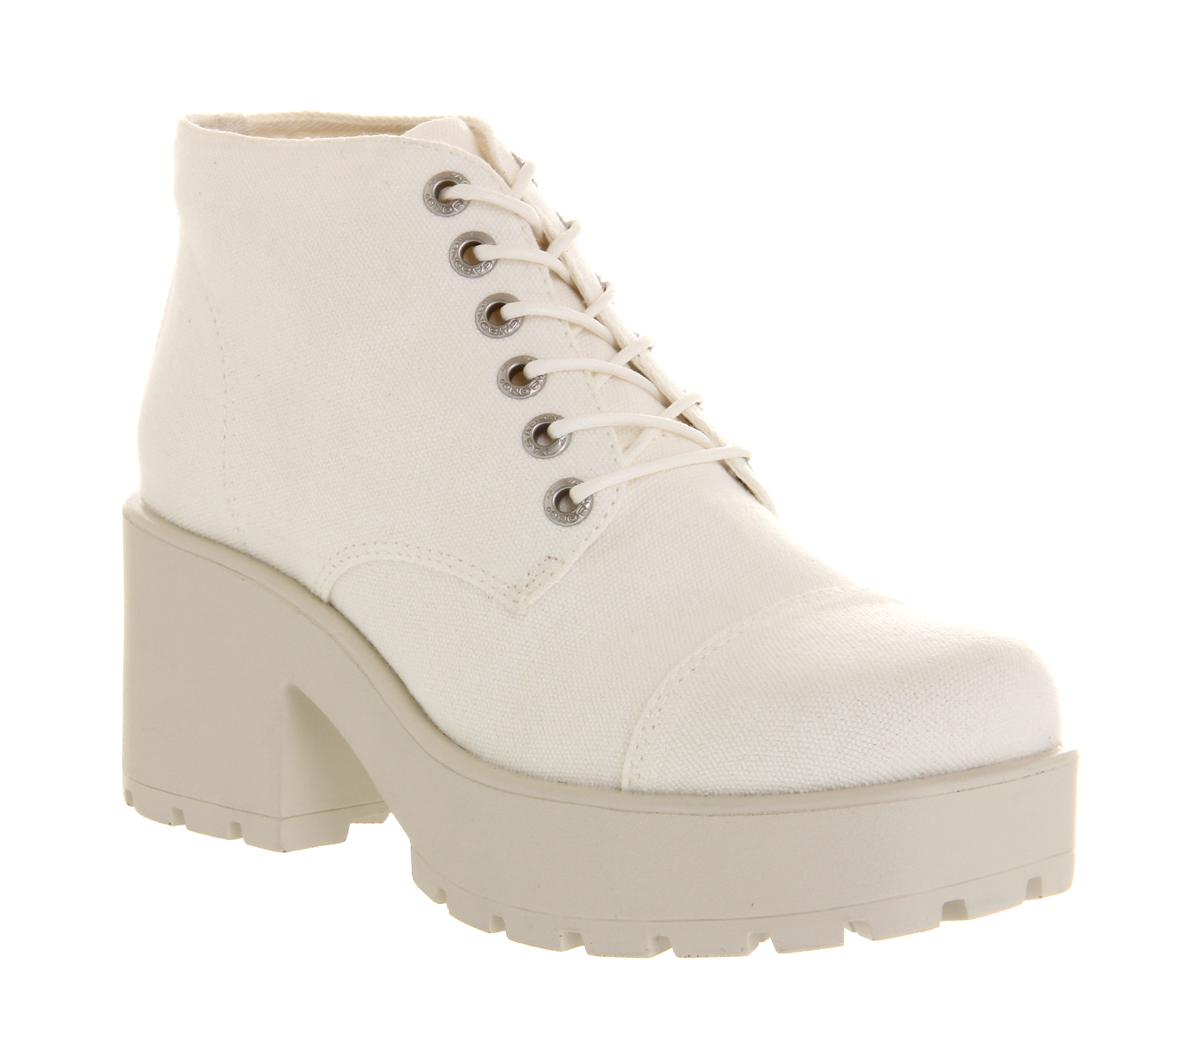 Unique U05d4u05deu05d2u05e4u05d9u05d9u05dd U05d4u05d0u05dcu05d5 - 2017 Fashion Women Boots Canvas Lace Up Zip Knee High Boots Women Boots Flat ...